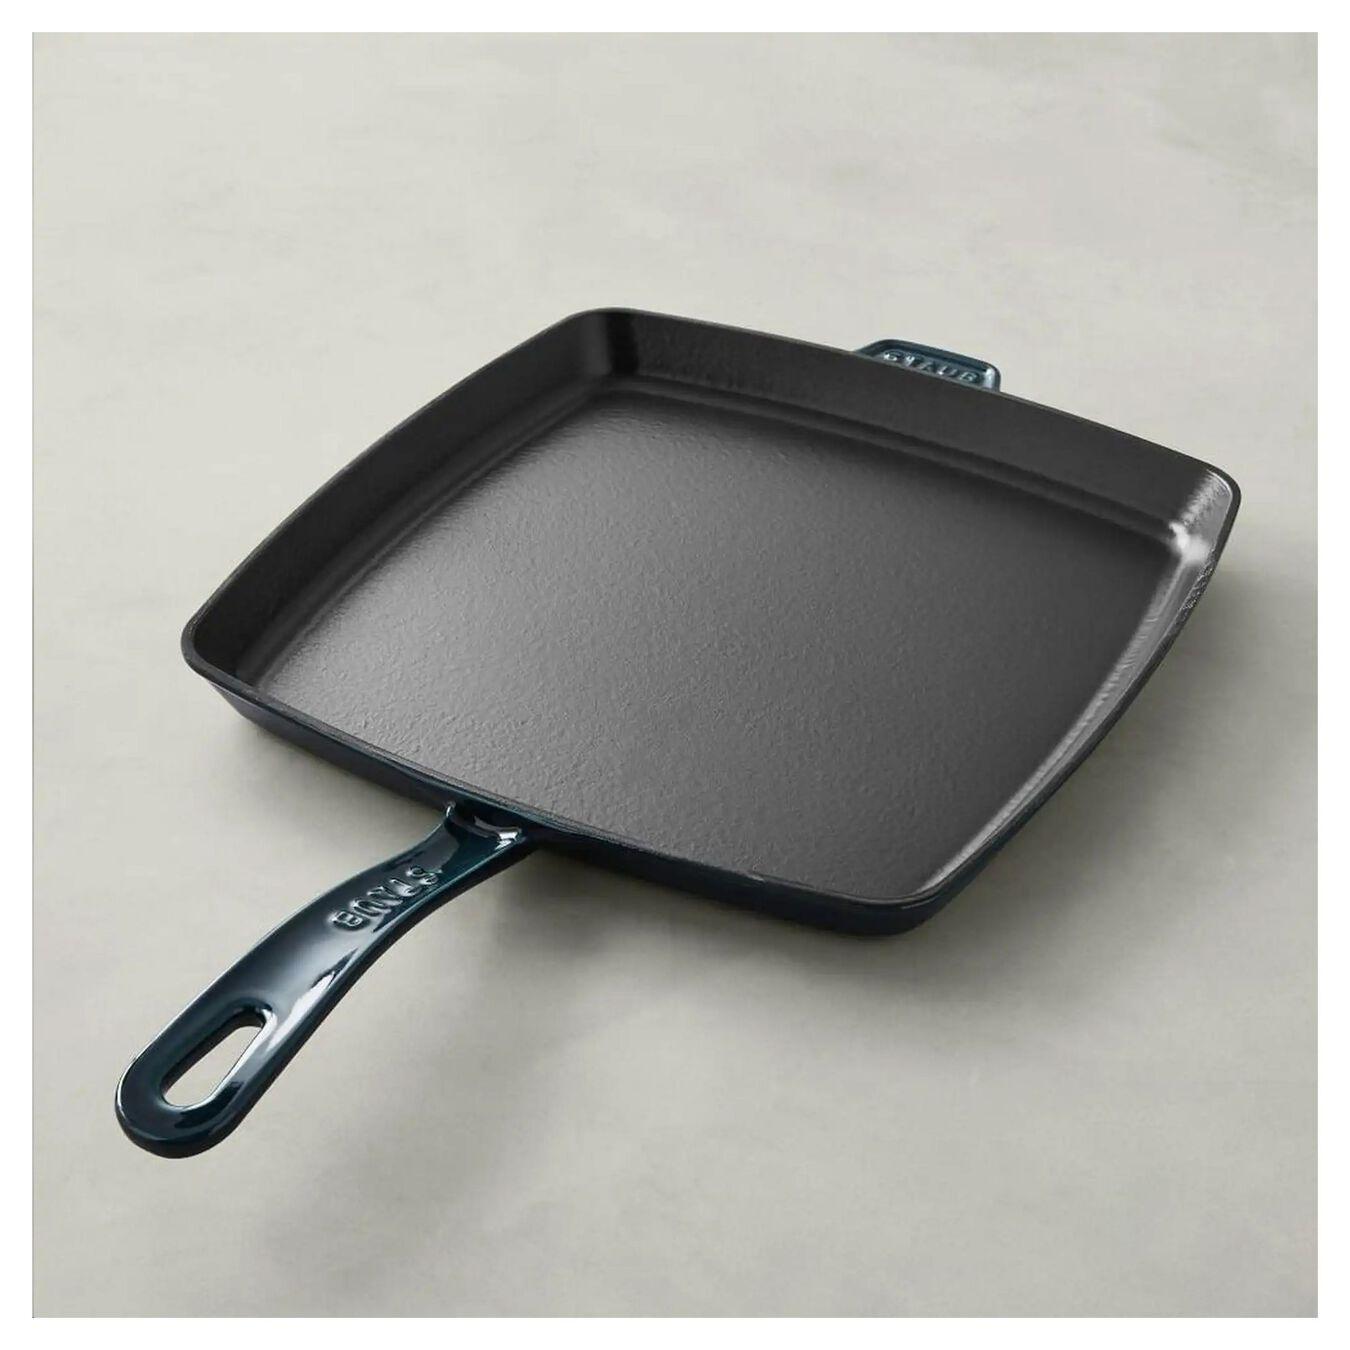 30 cm / 12 inch Cast iron Frying pan, la-mer,,large 1